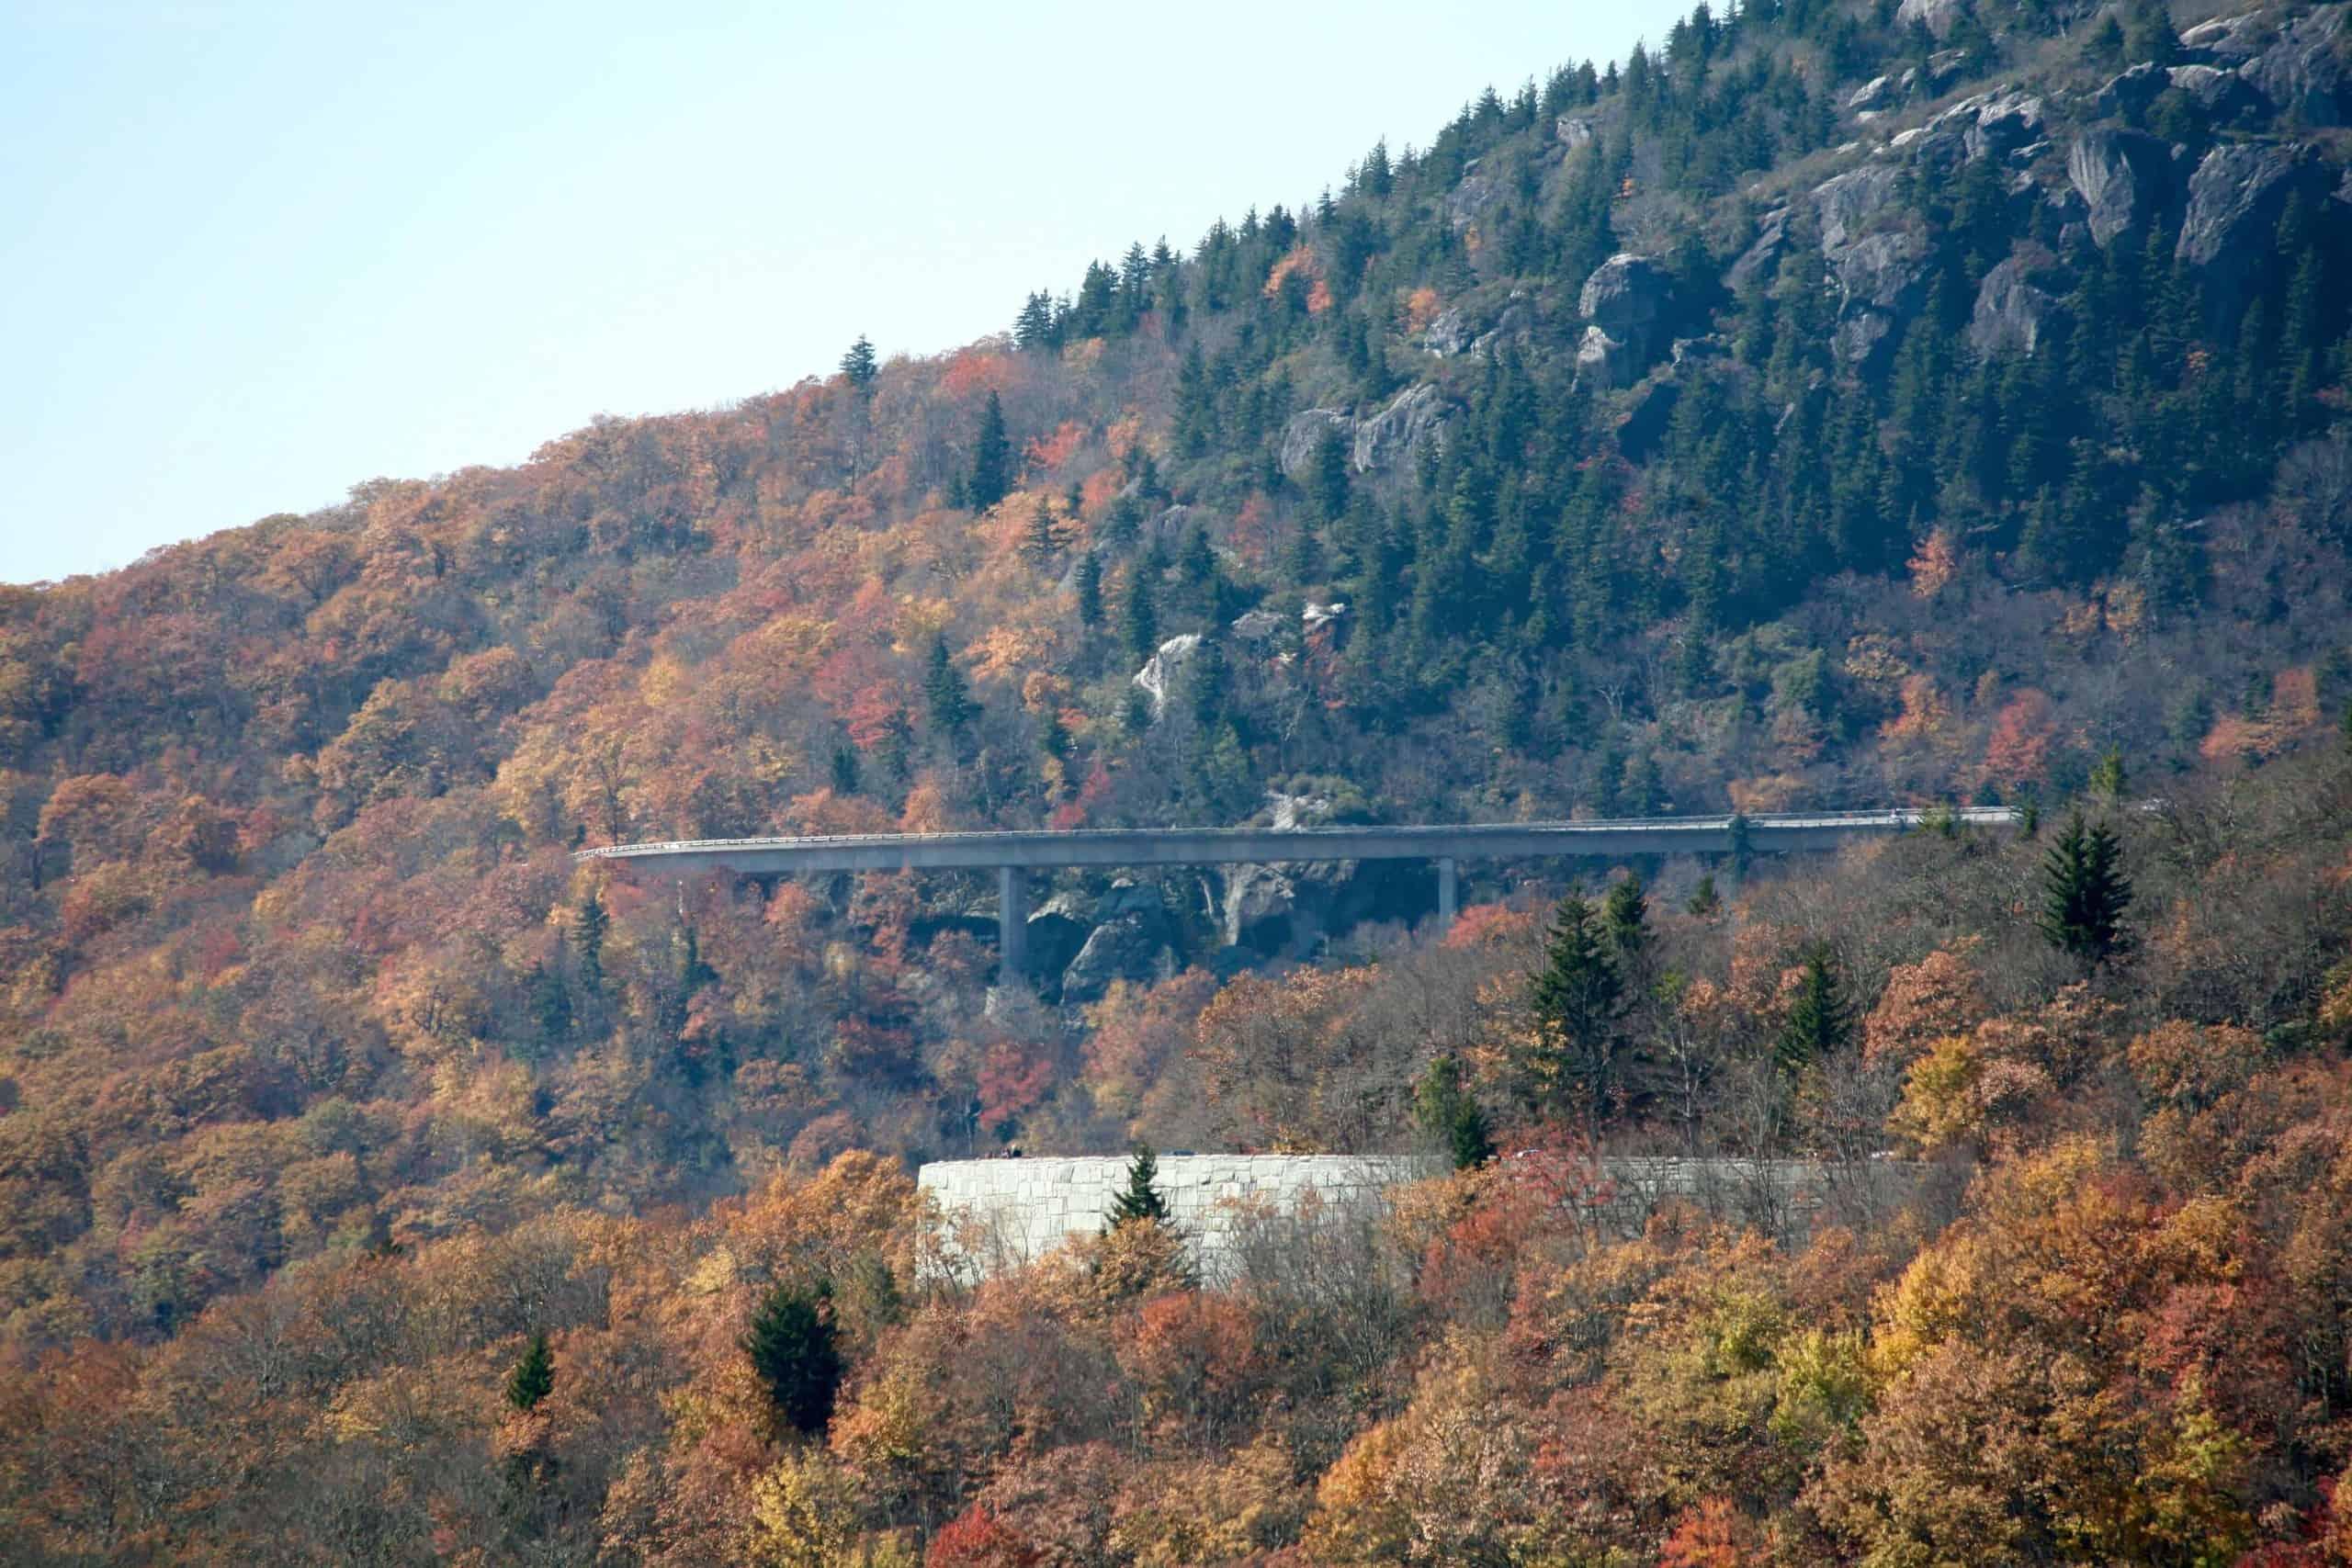 img_8870/blue ridge parkway